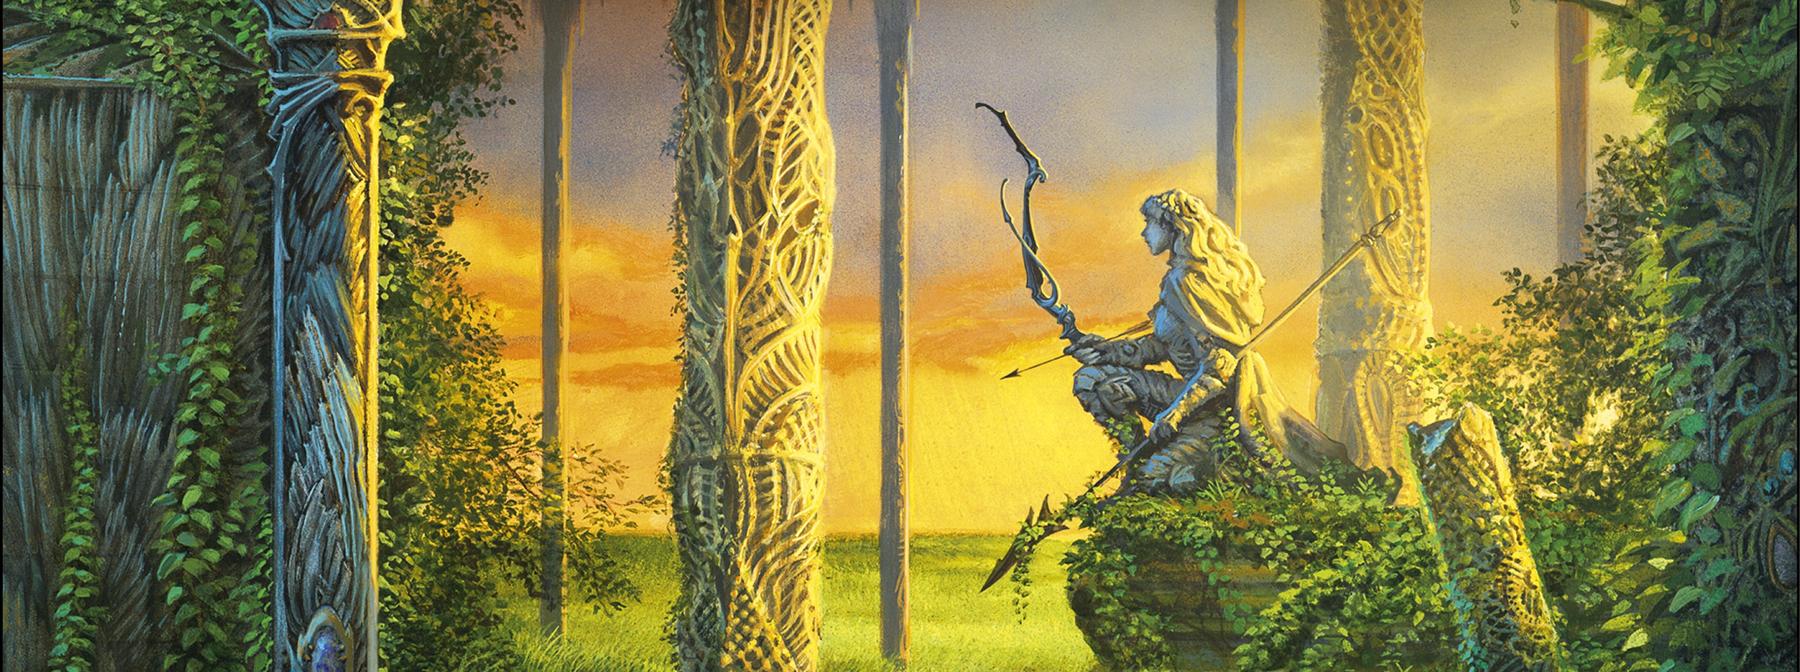 Book Review: Empire of Grass